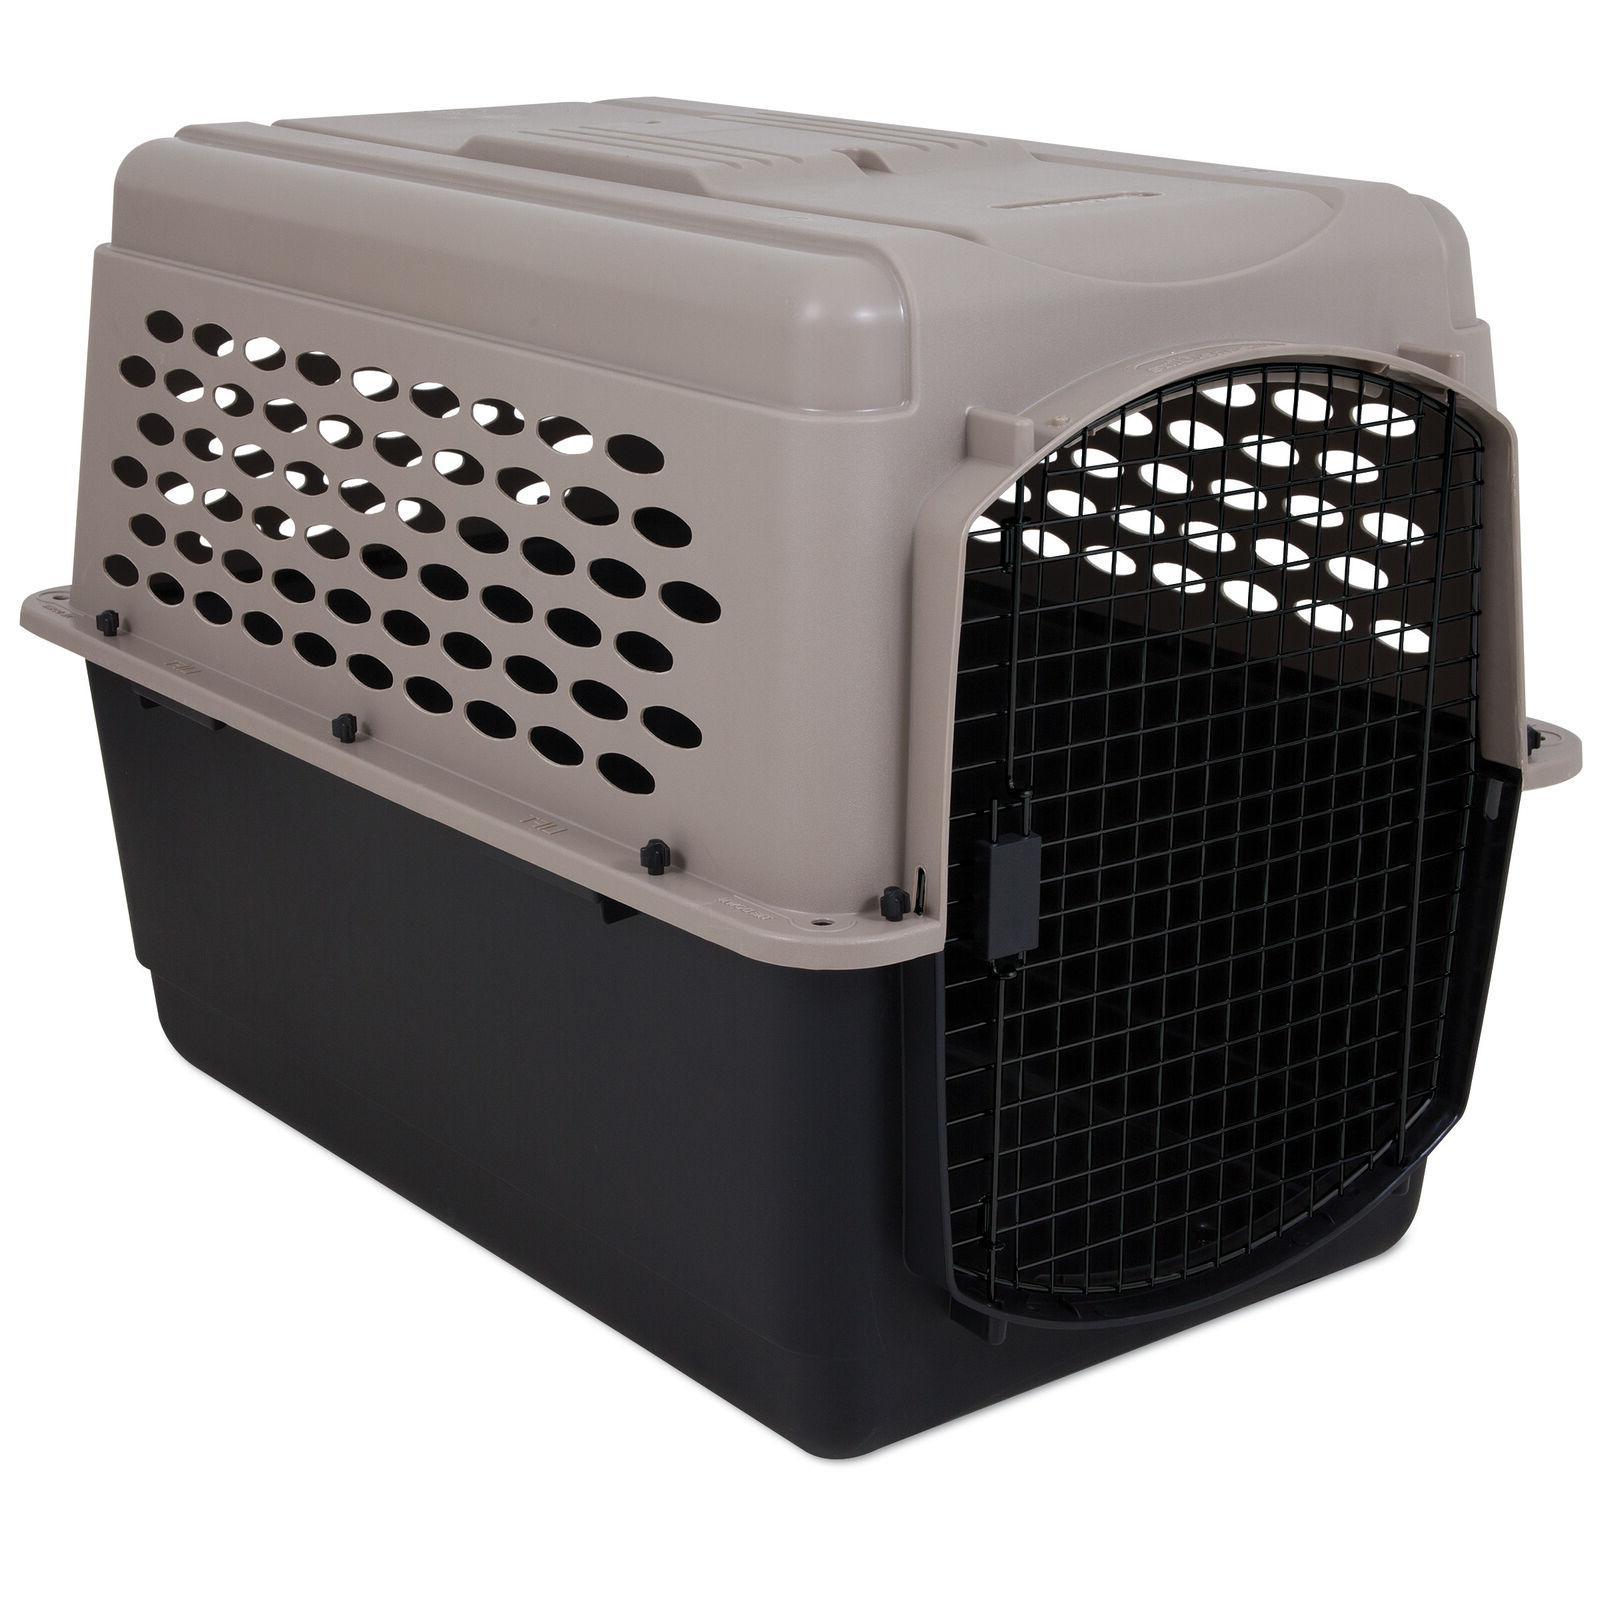 Vari Kennel 500 Plastic Dog Crates 2 Pack